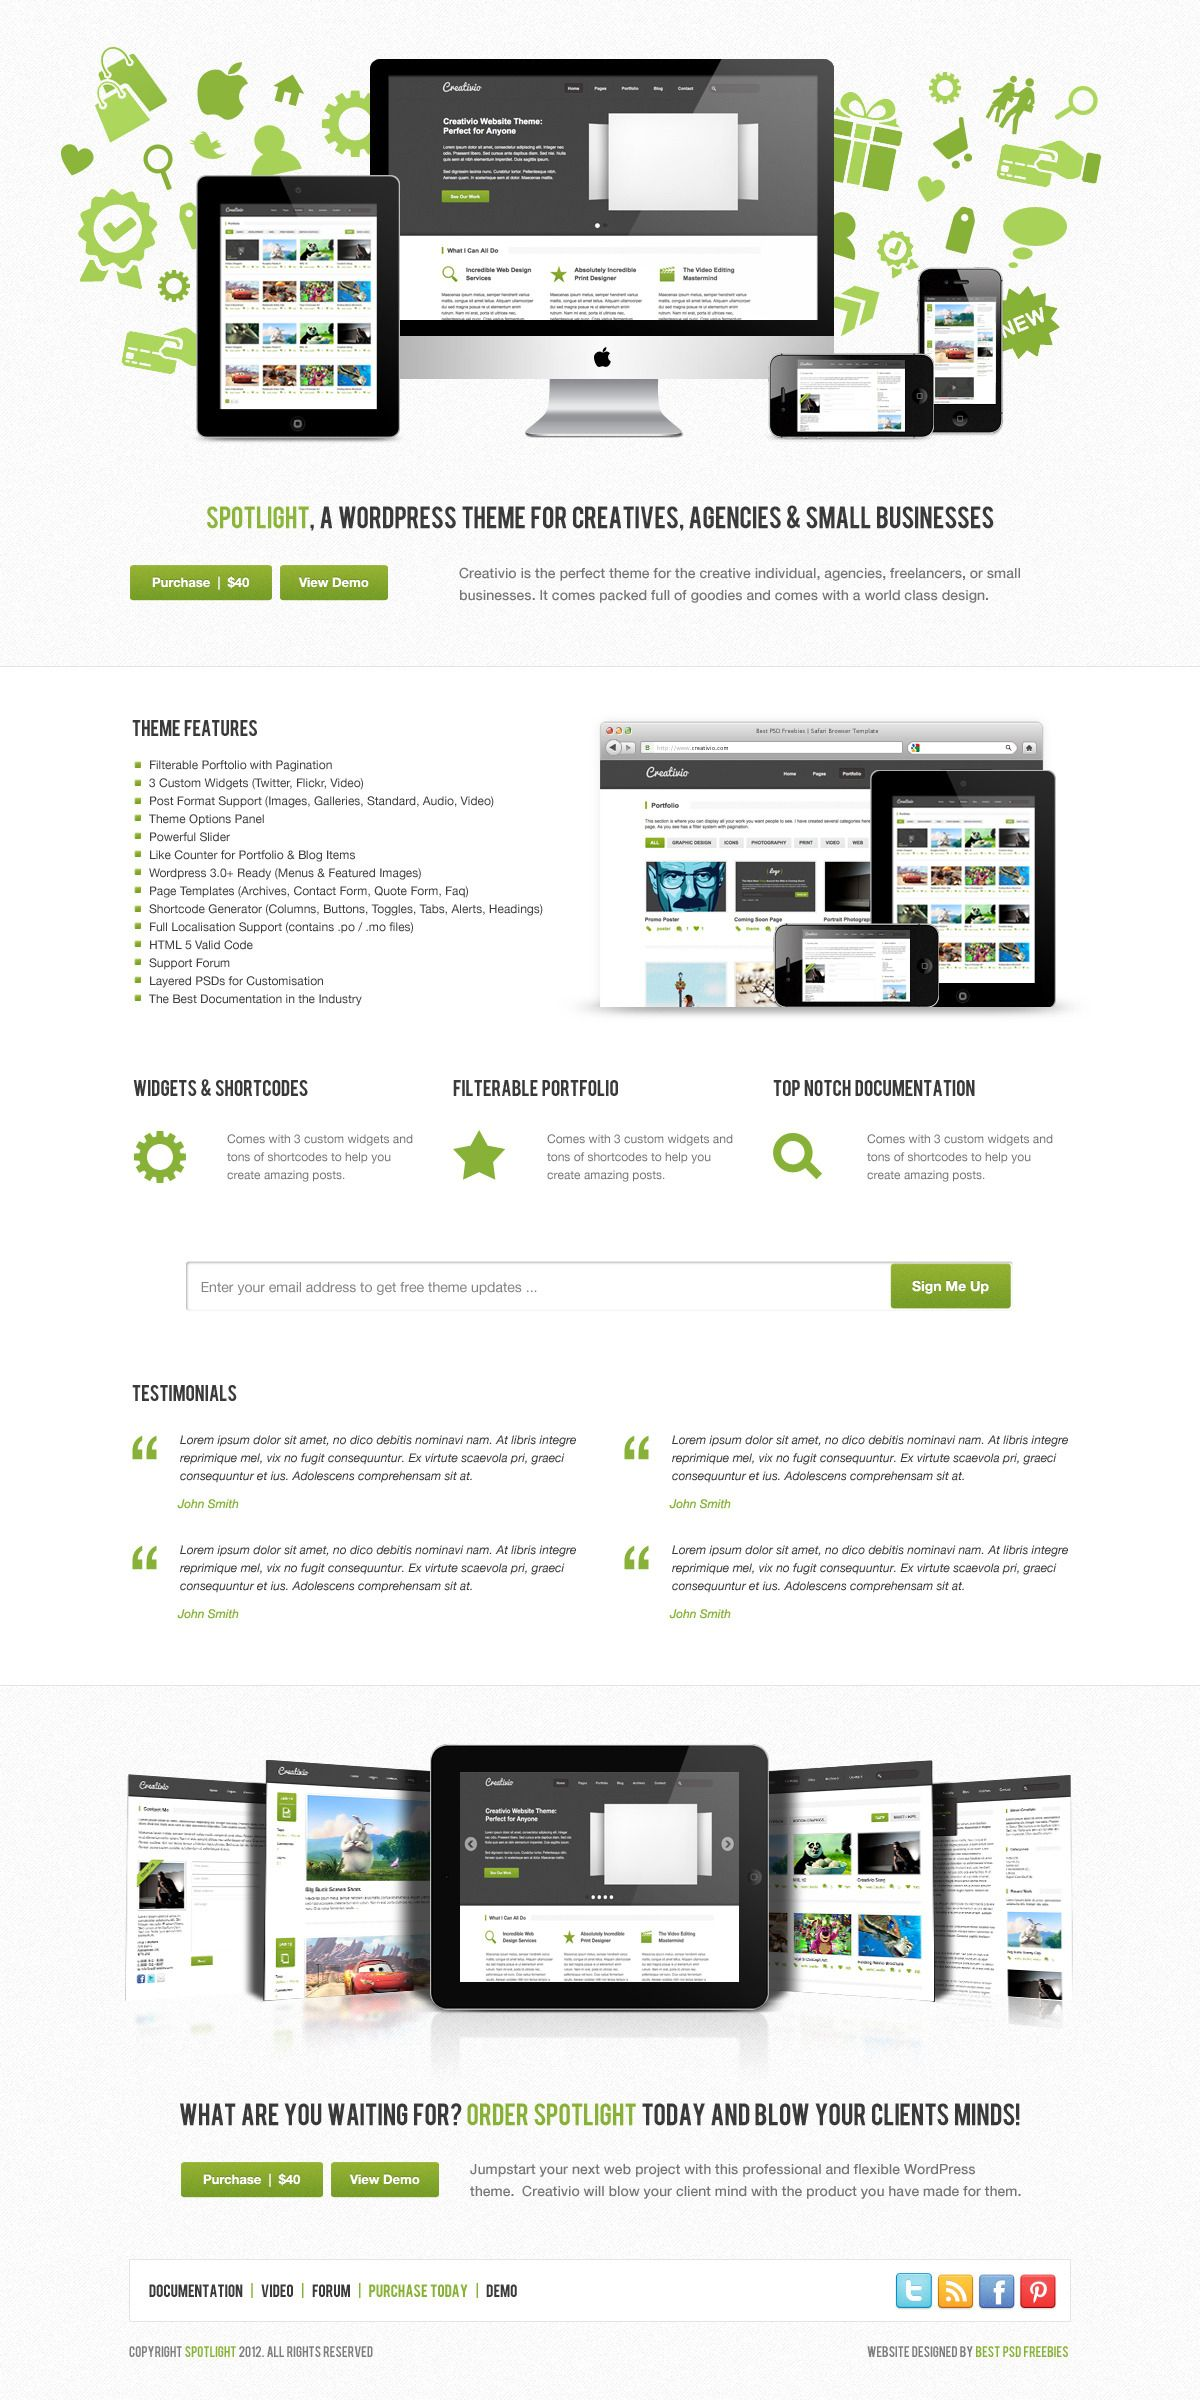 spotlight product launch web design theme web design pinterest